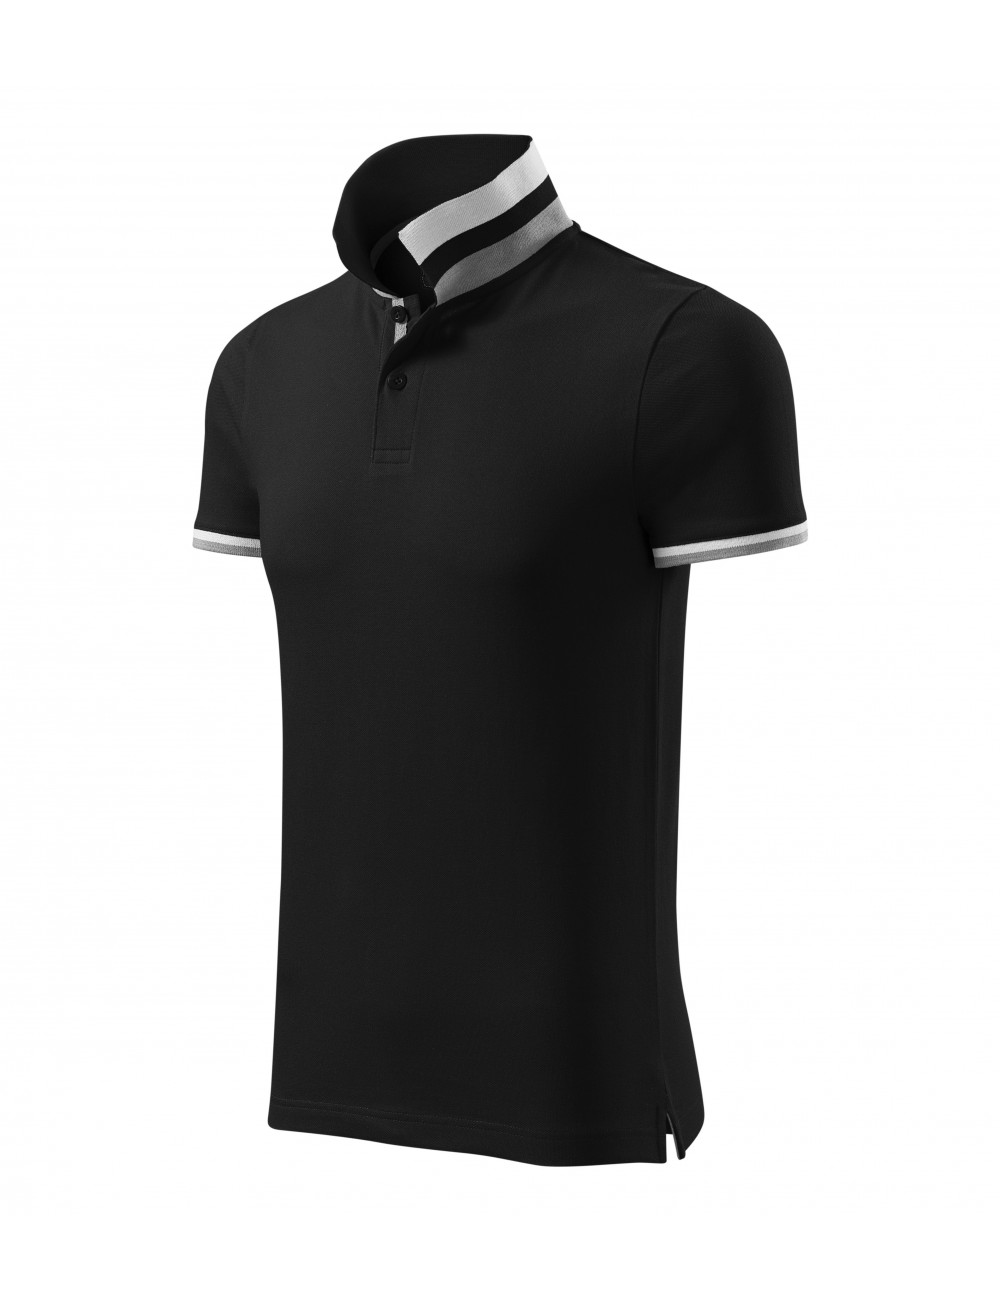 Adler MALFINIPREMIUM Koszulka polo męska Collar Up 256 czarny